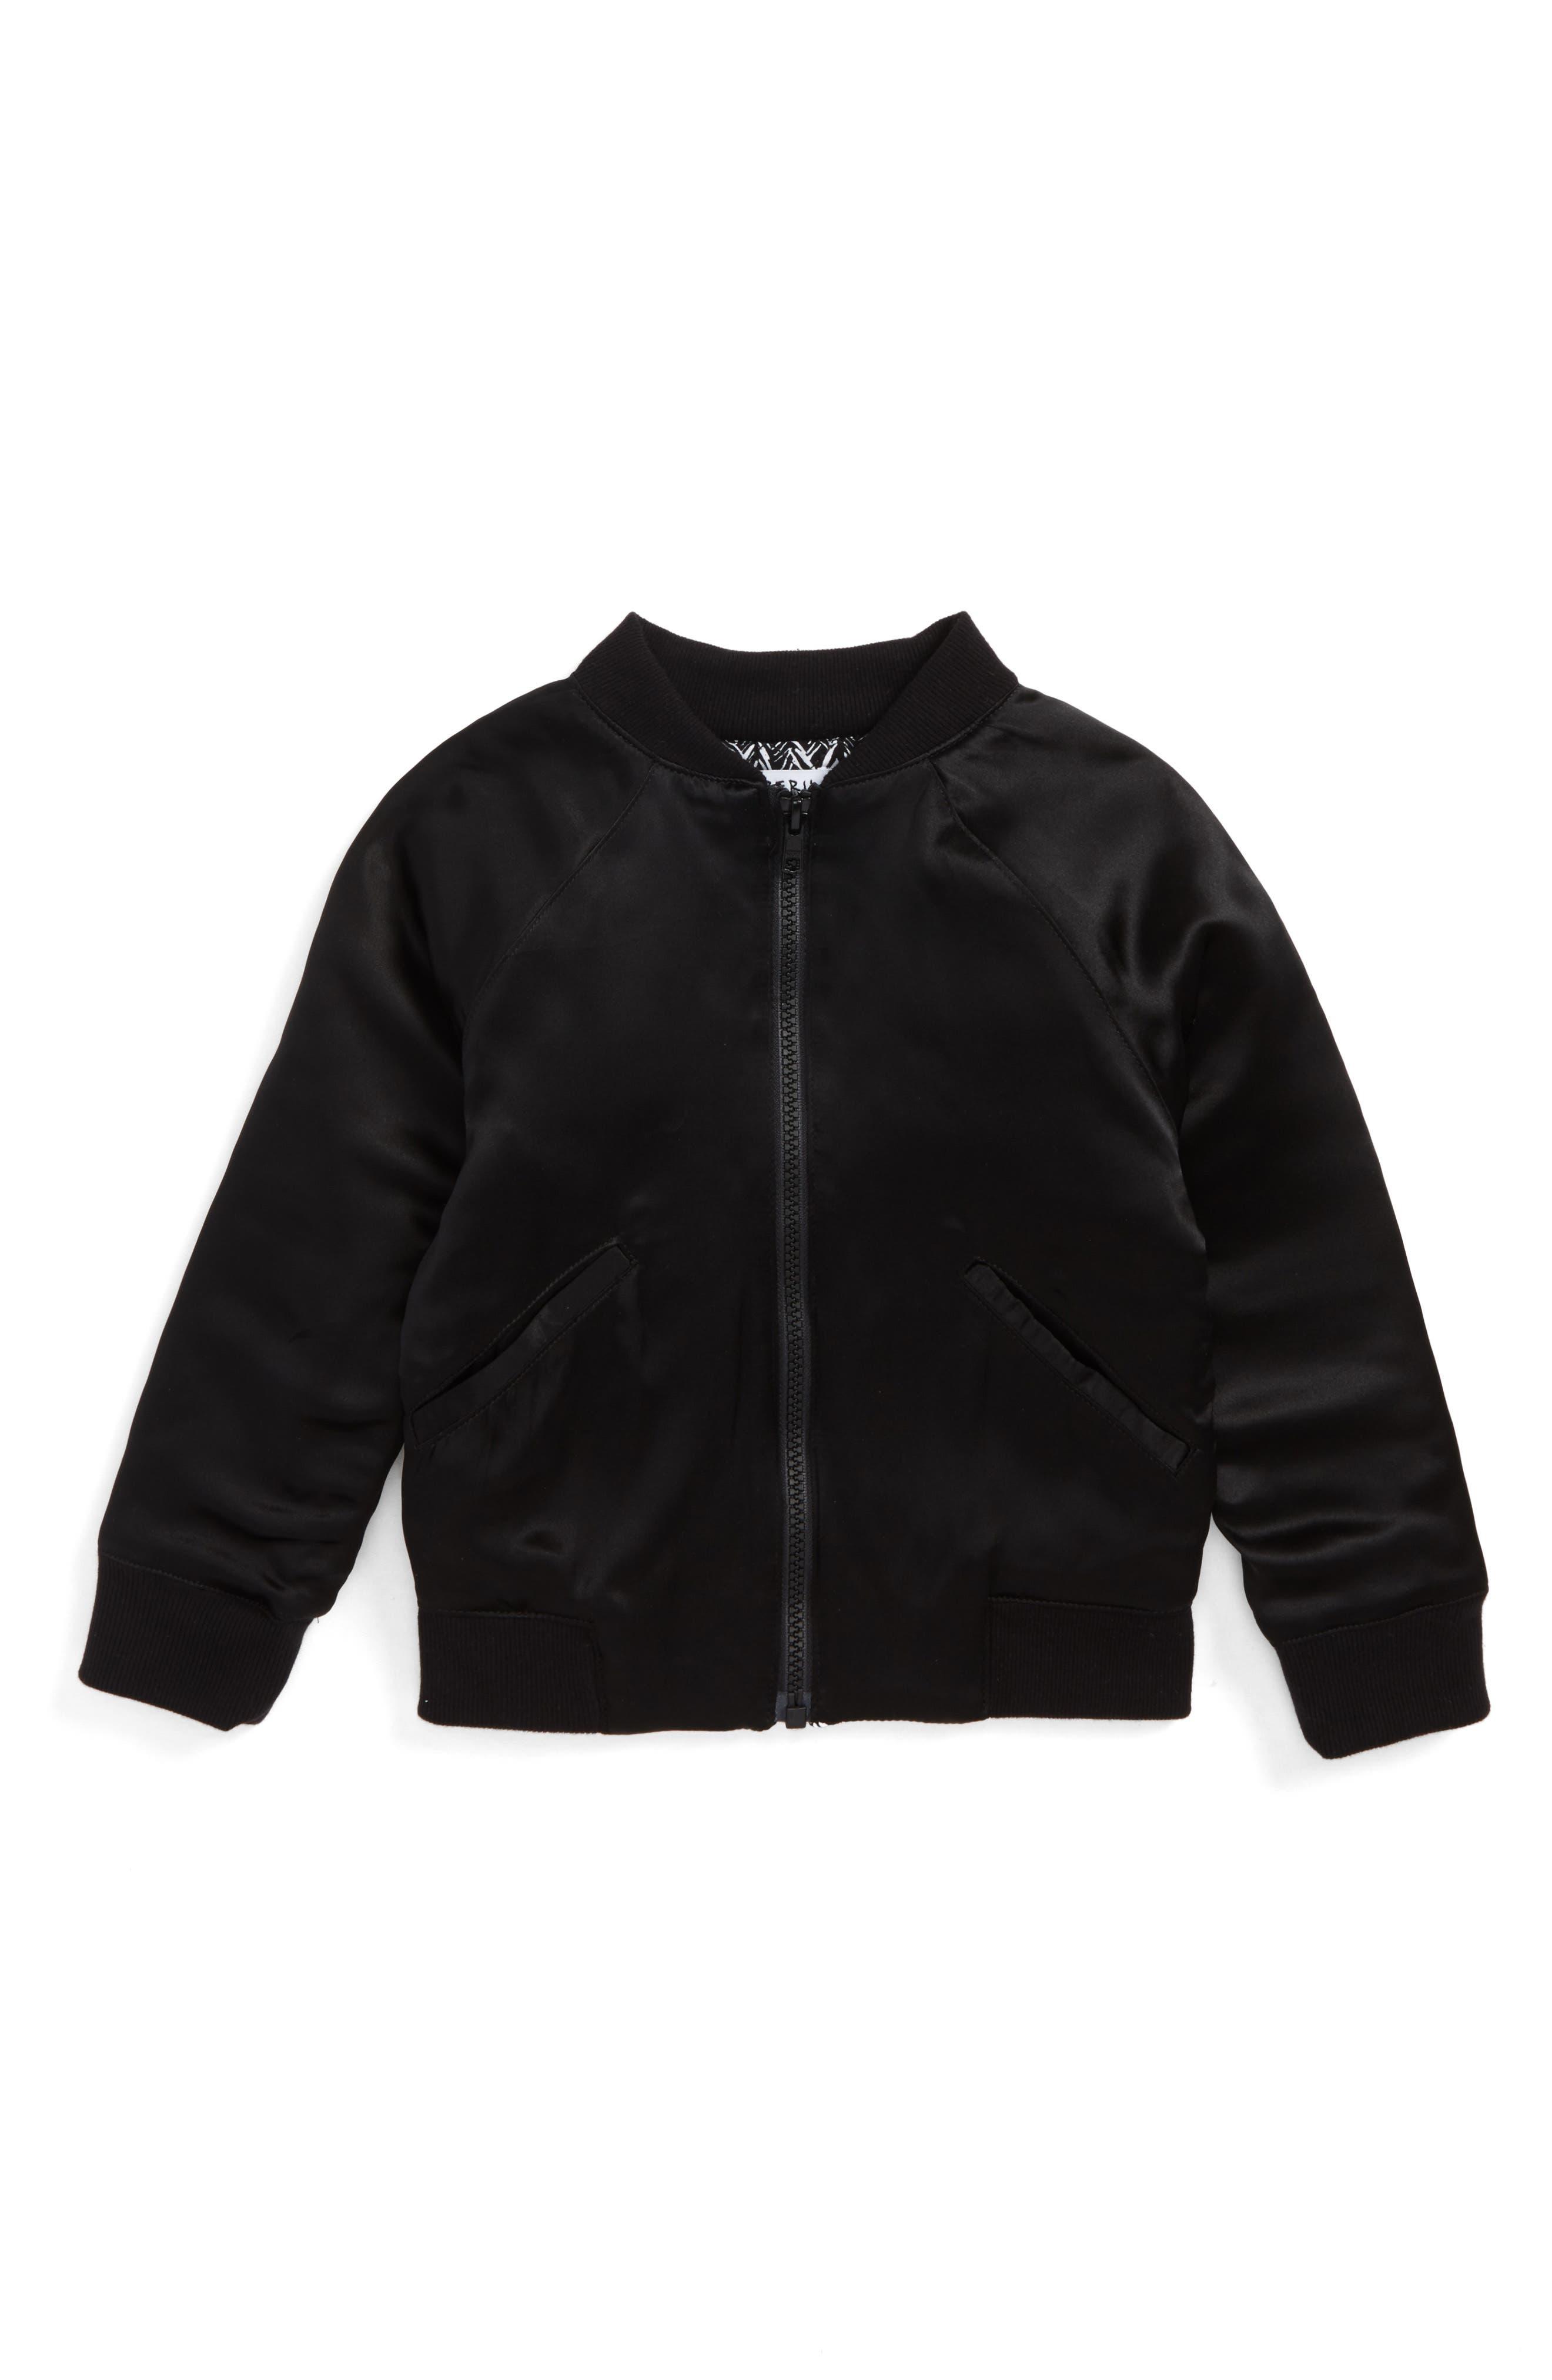 Tristan Silk Bomber Jacket,                         Main,                         color,